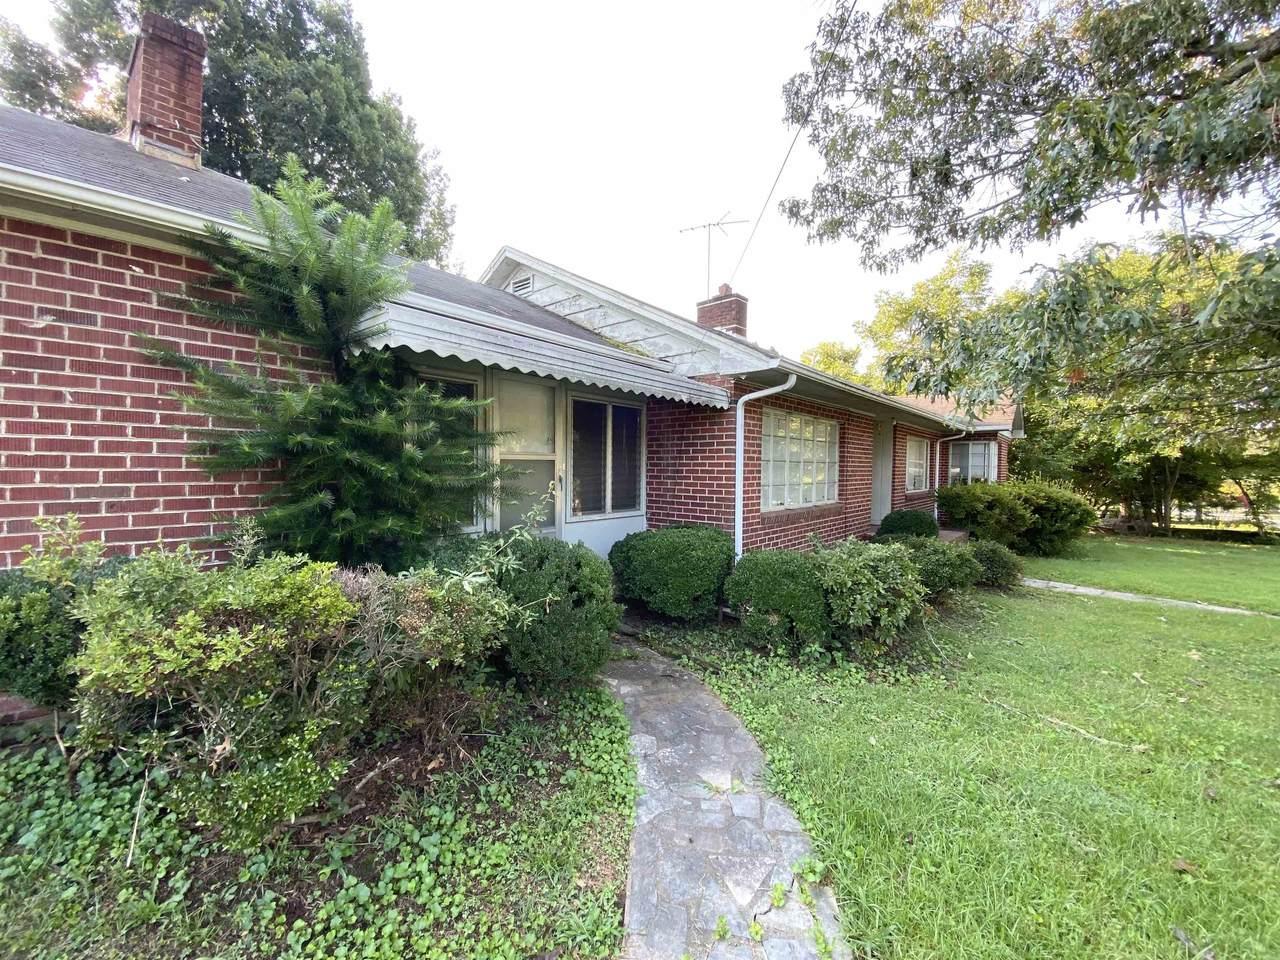 418 N Alabama Ave - Photo 1